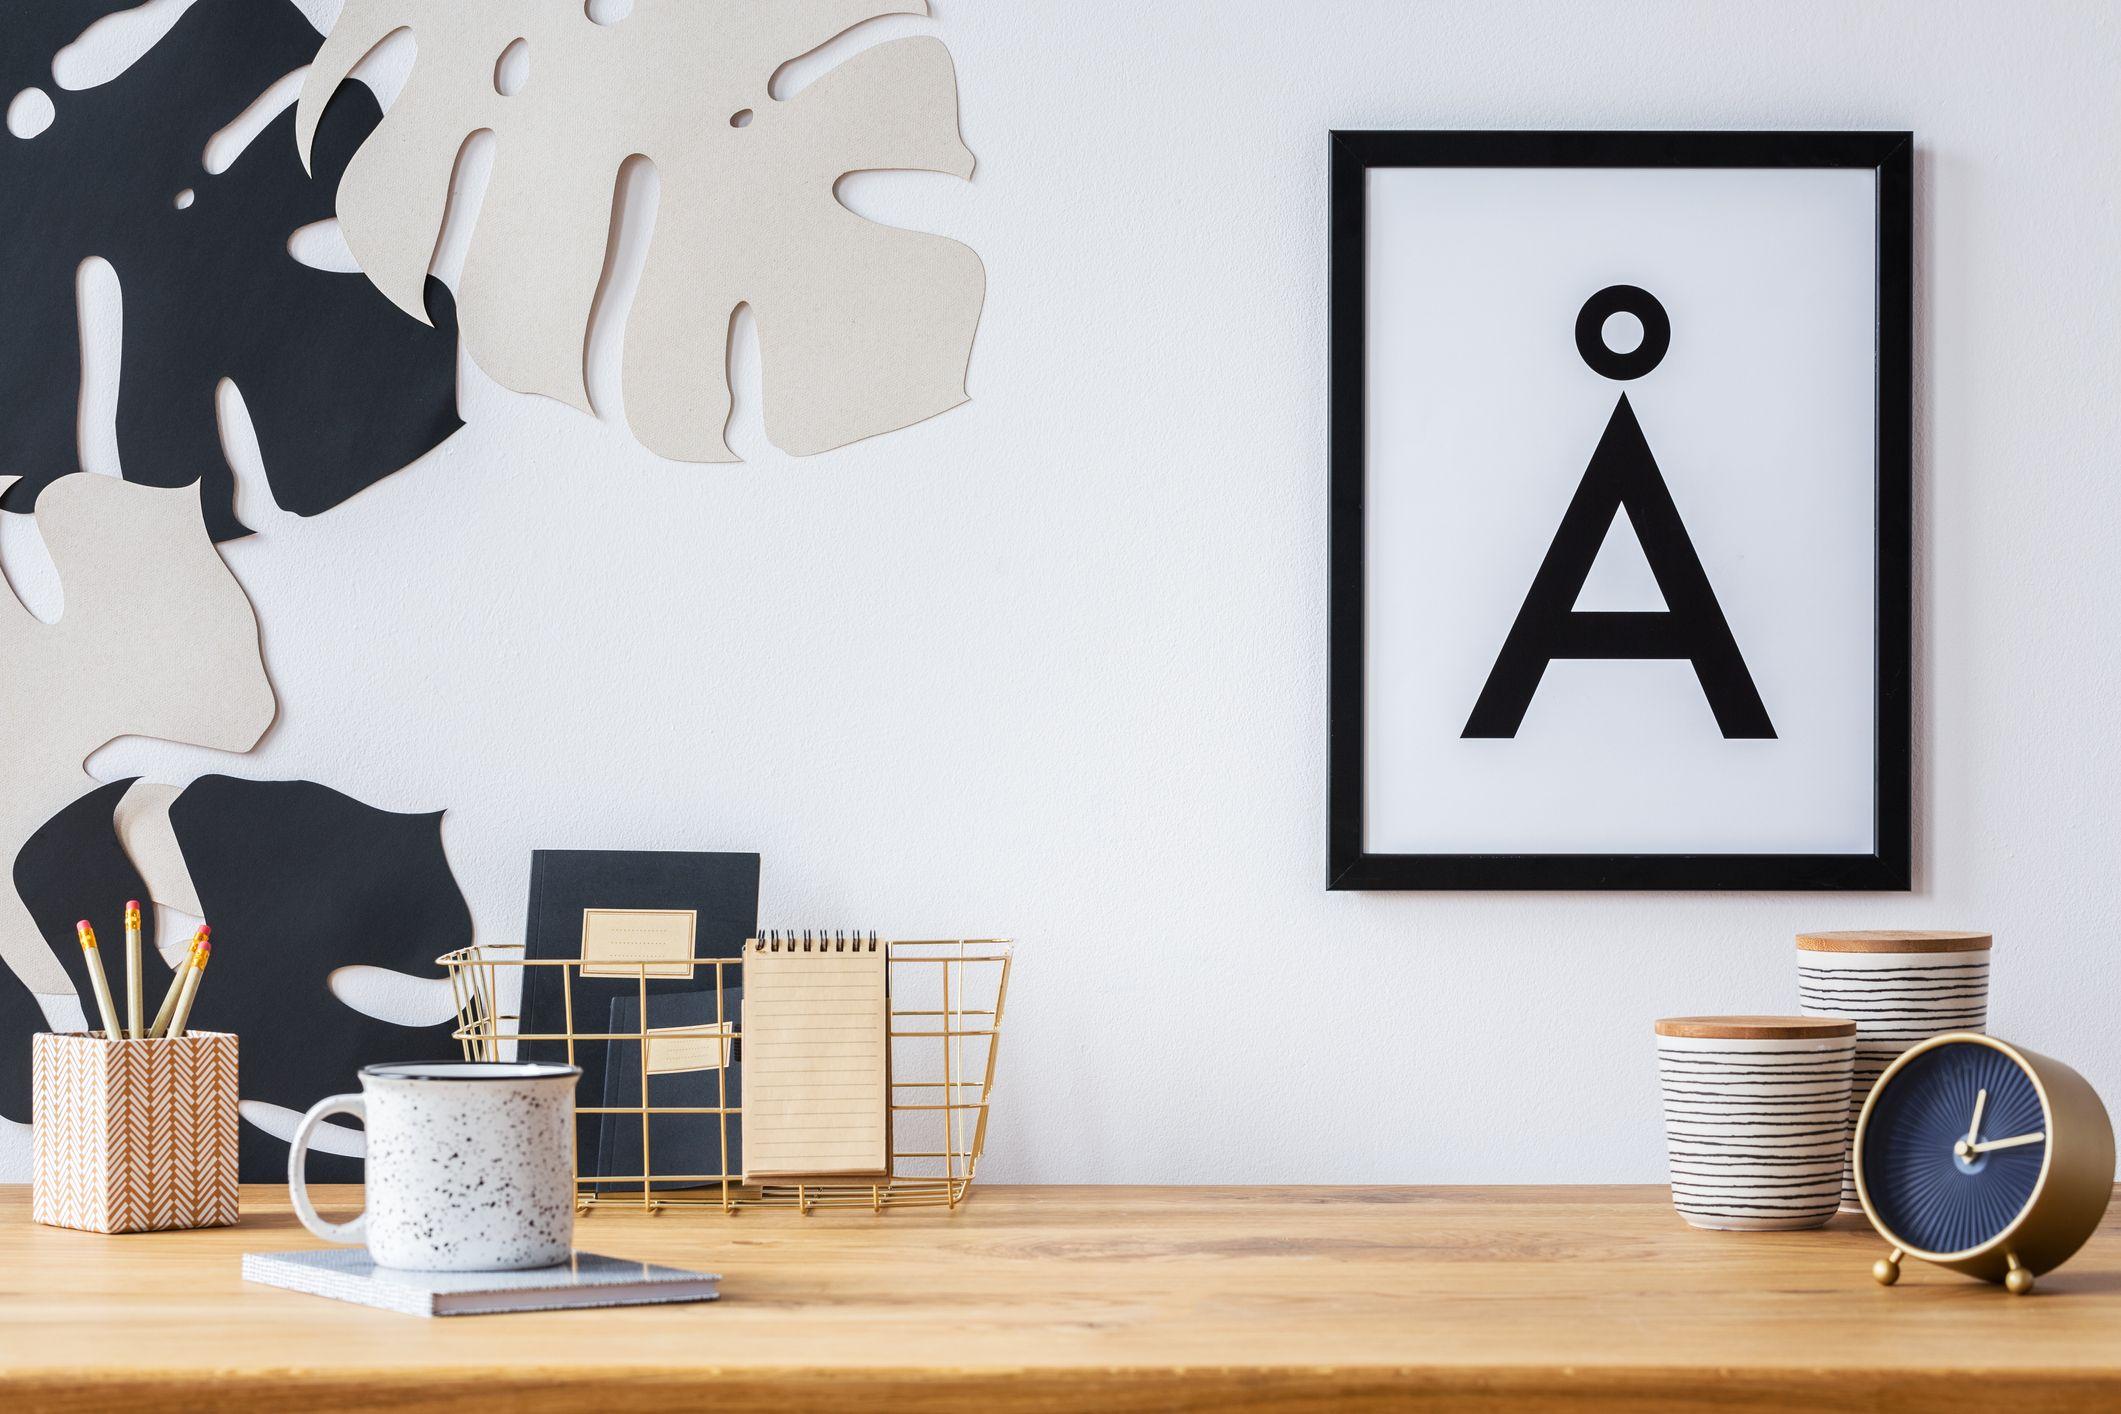 Best Cubicle Decor Ideas - Creative